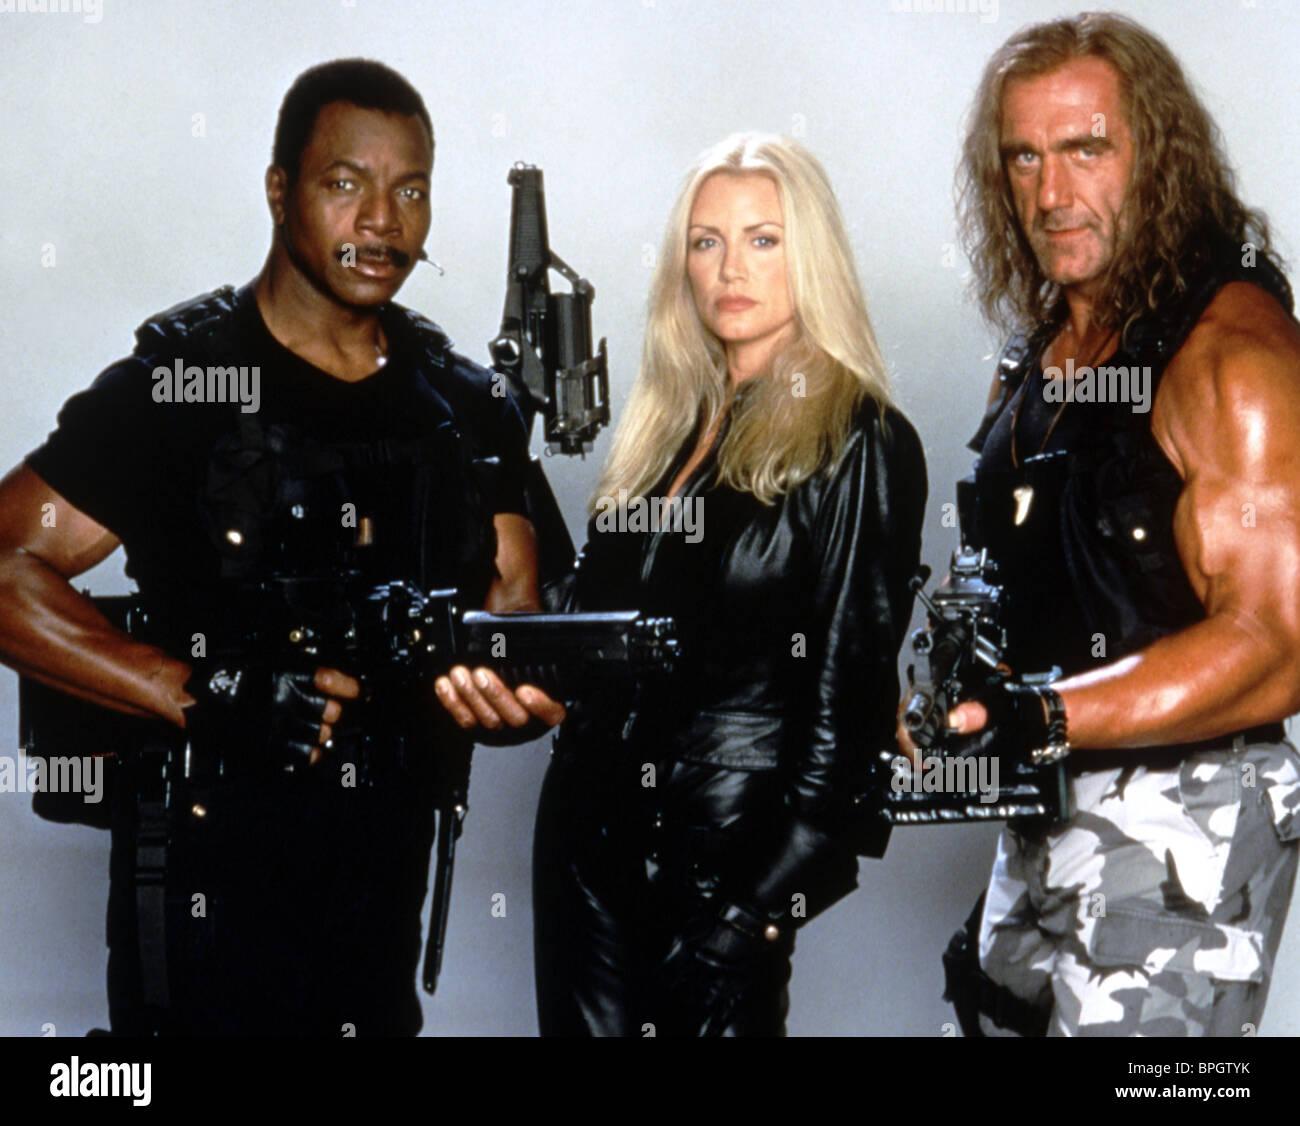 shadow warriors assault on devils island full movie